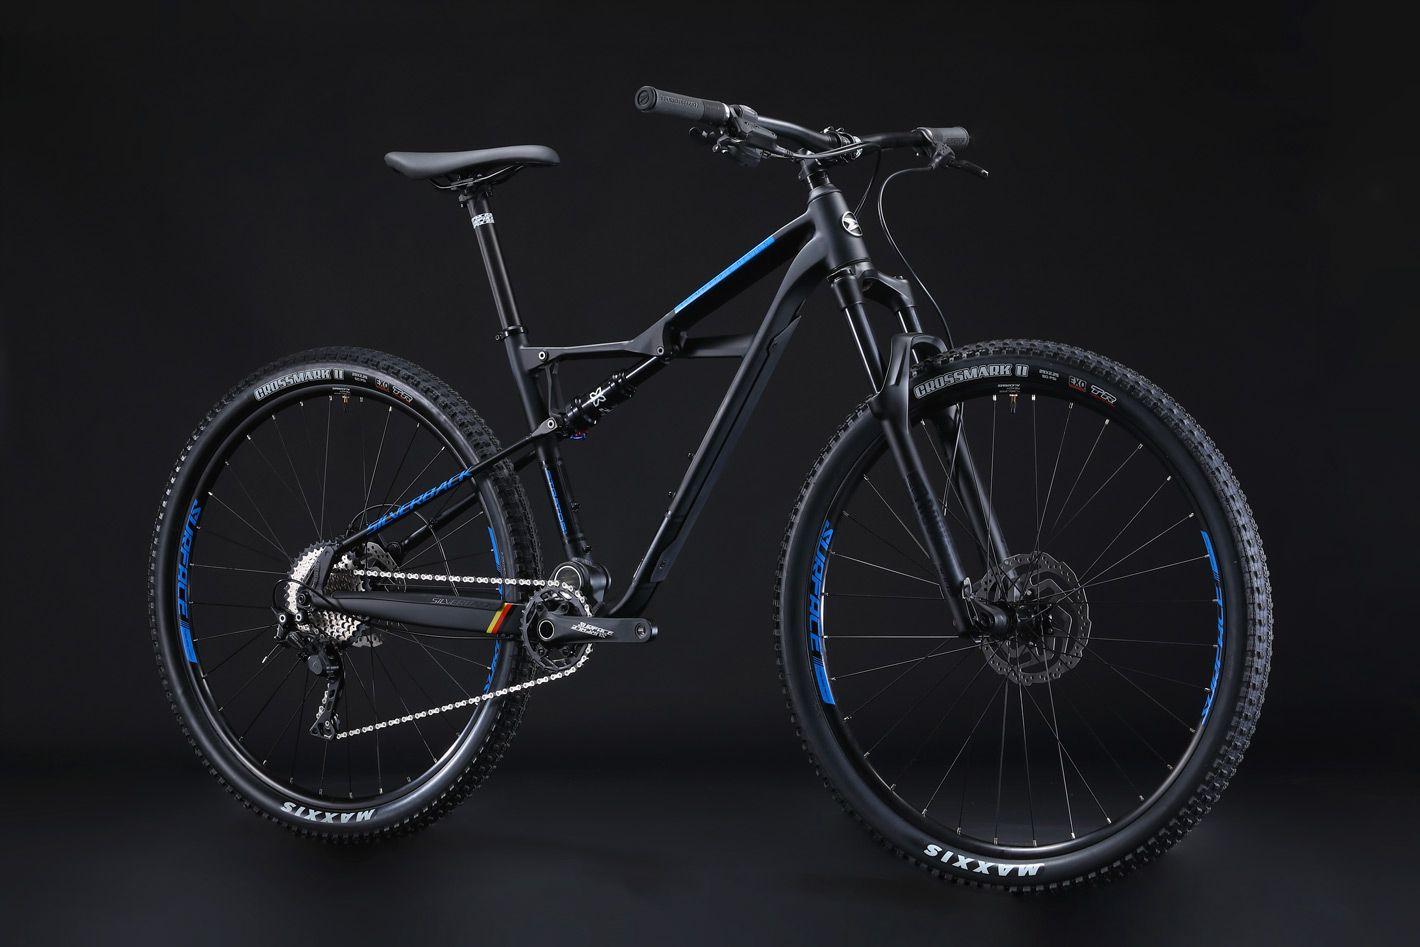 5 Mountain Under 1500 Silverbackbikes Read More Link In Bio Borntobefast Bicycle Racing Bikes Suspension Bike